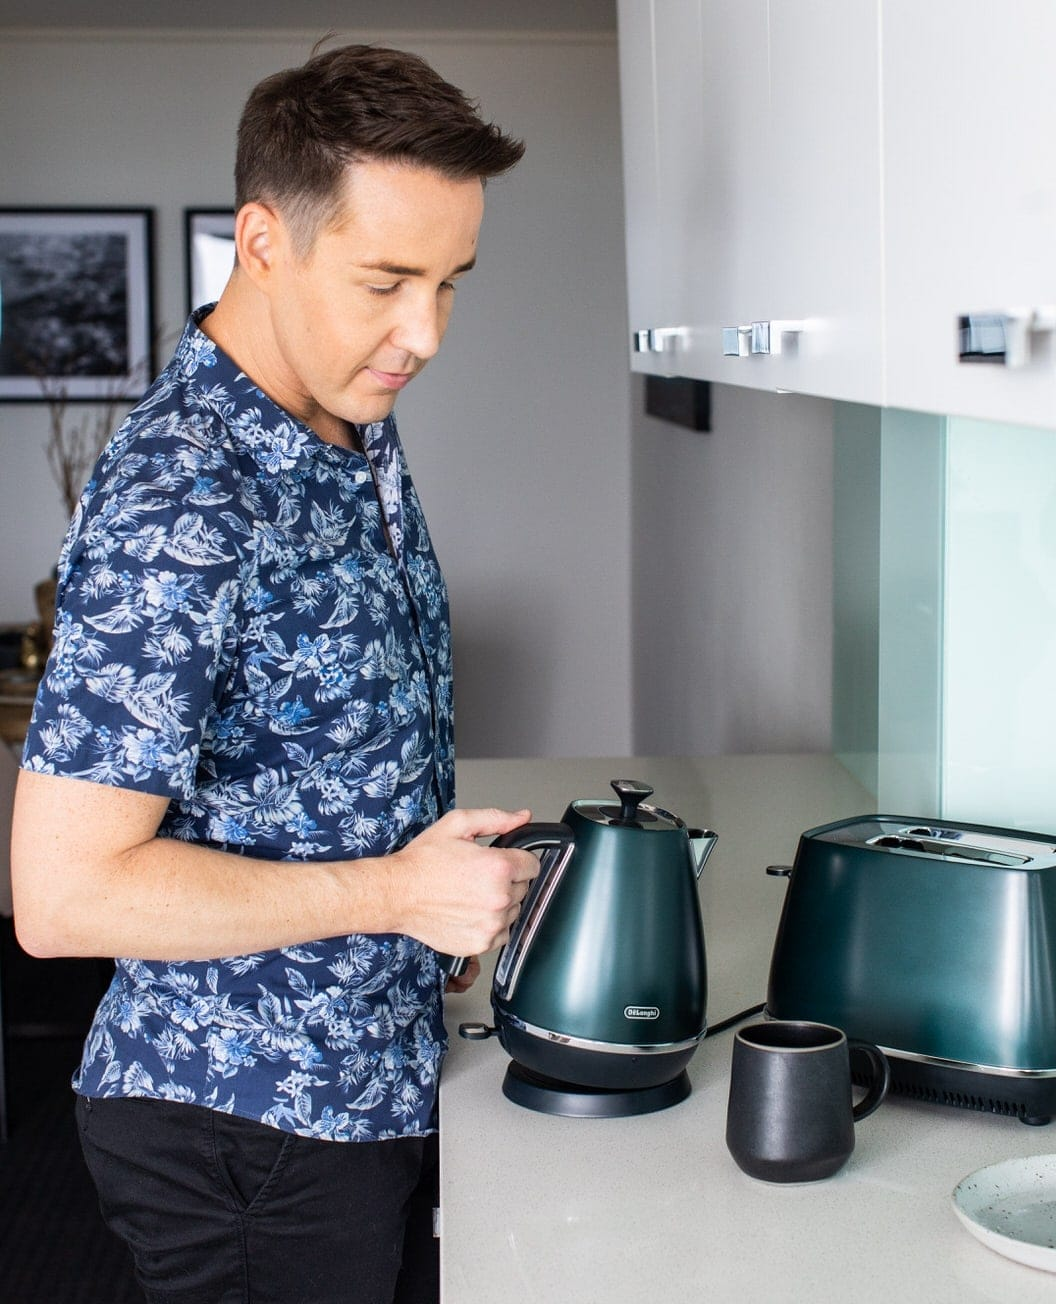 chris carroll tlc interiors delonghi prestige blue kettle and toaster